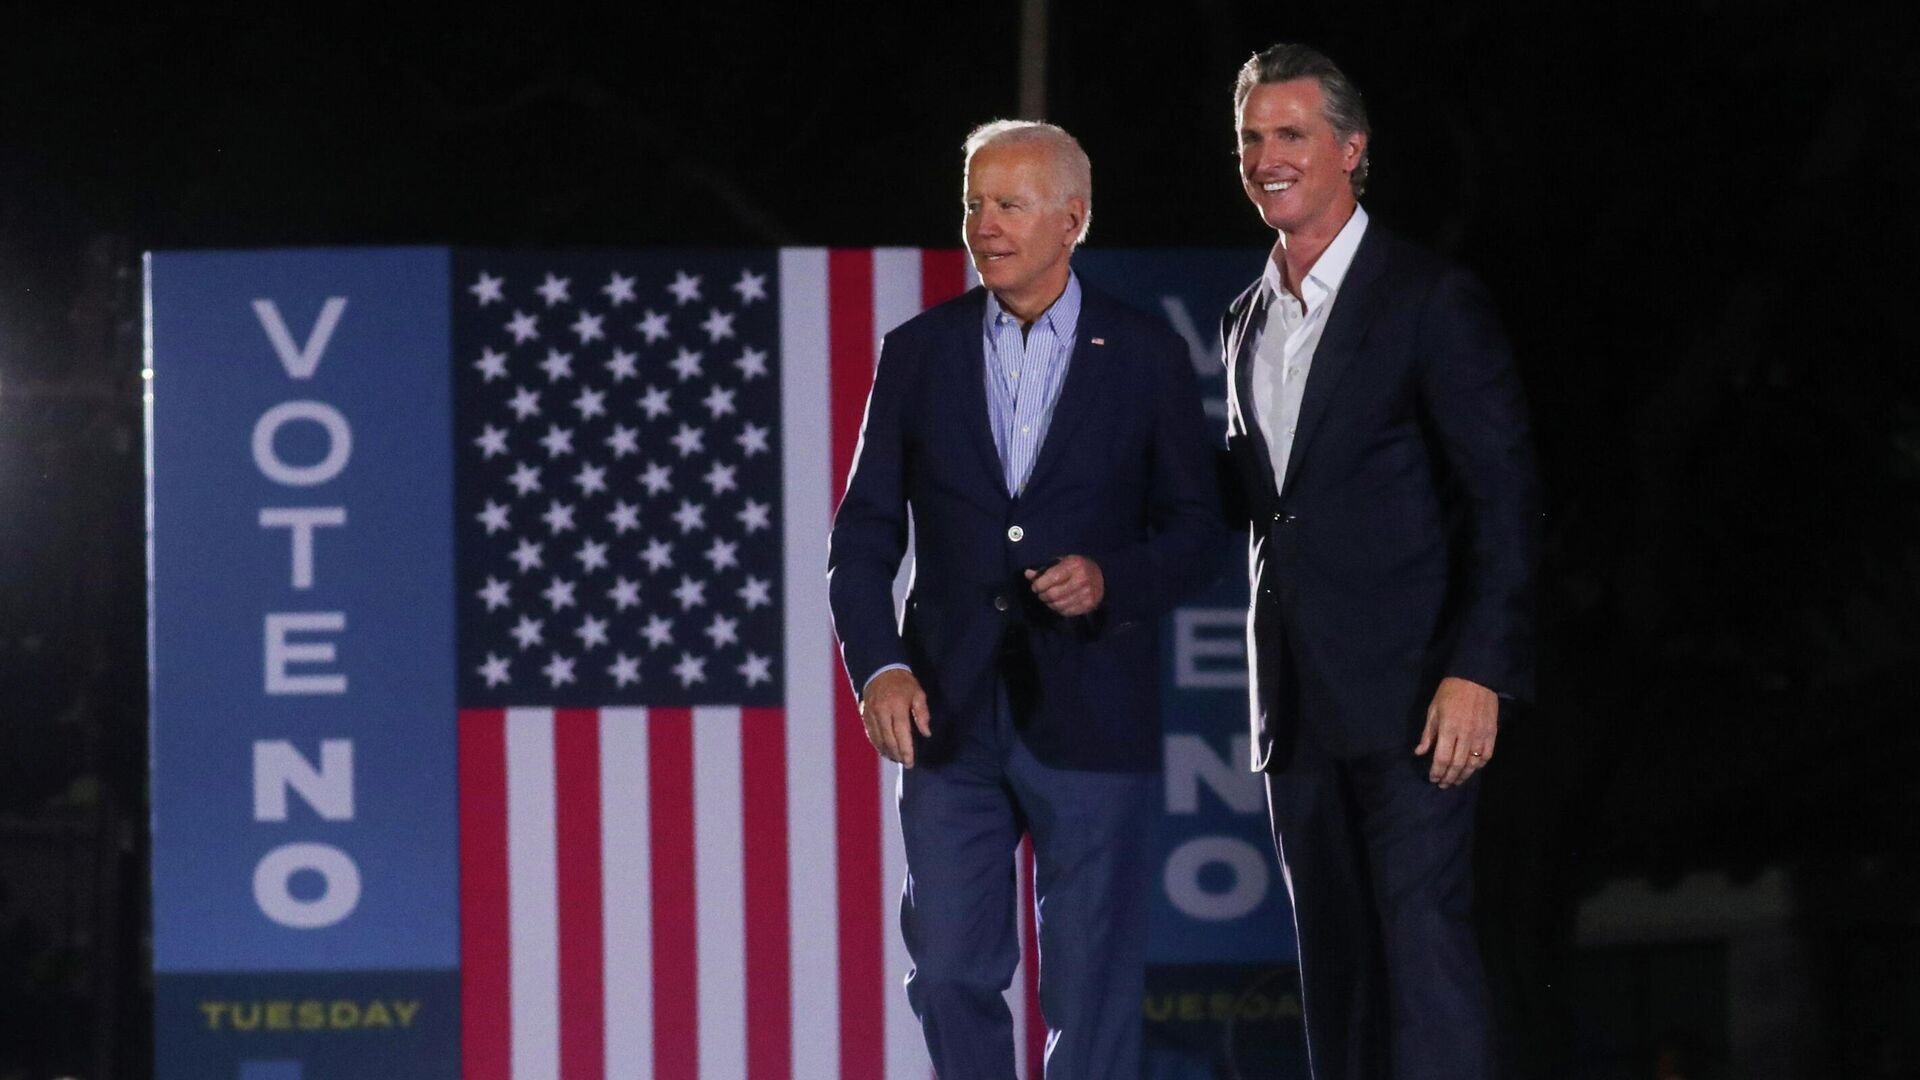 US President Joe Biden walks with California Governor Gavin Newsom at an election rally - Sputnik International, 1920, 14.09.2021